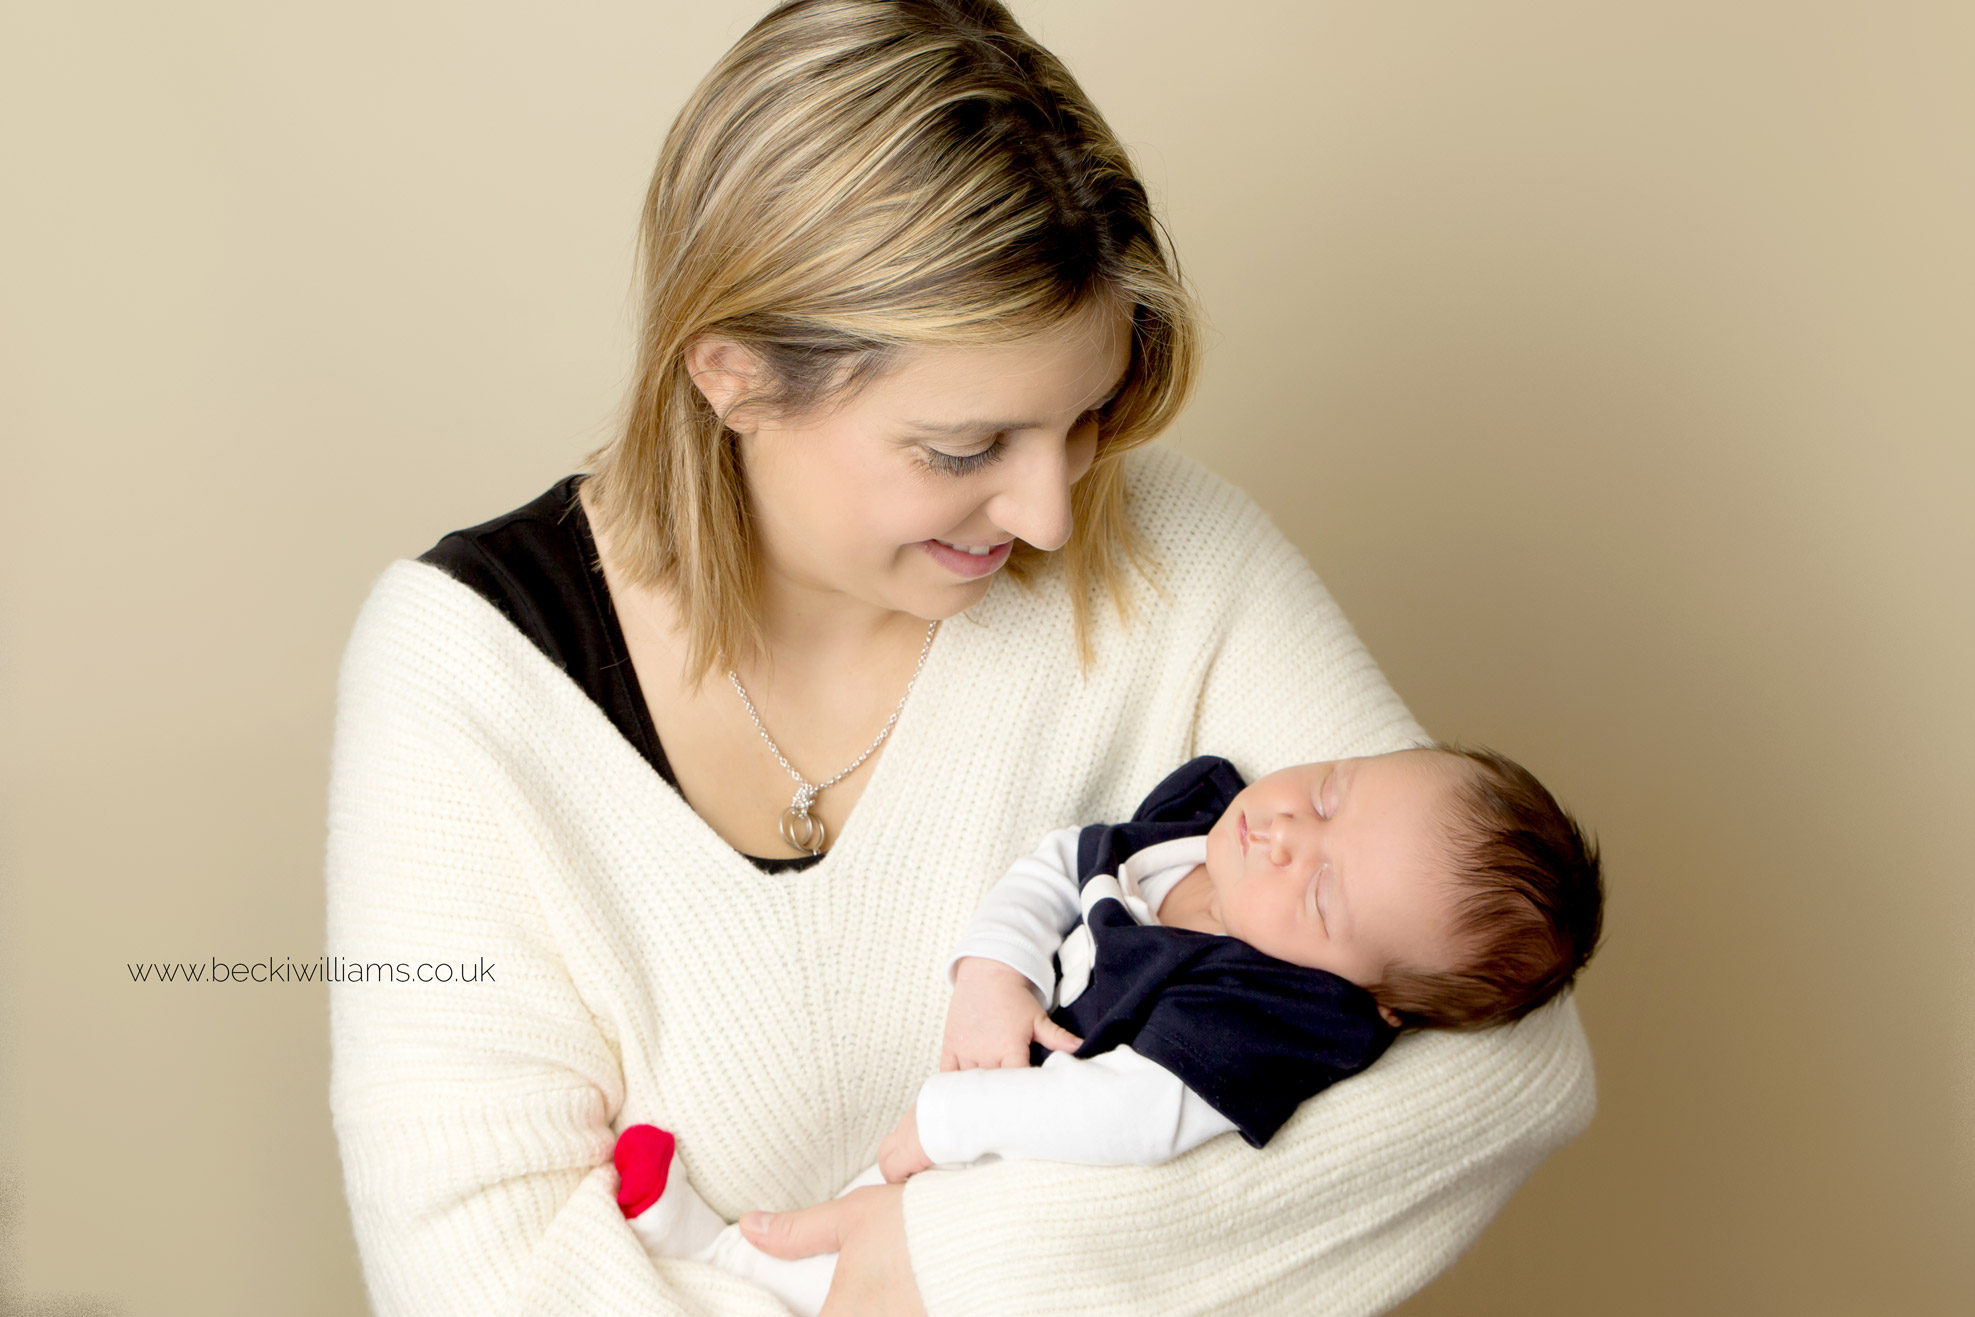 newborn-girl-portraits-hemel-hempstead-new-mum-family-photos.jpg